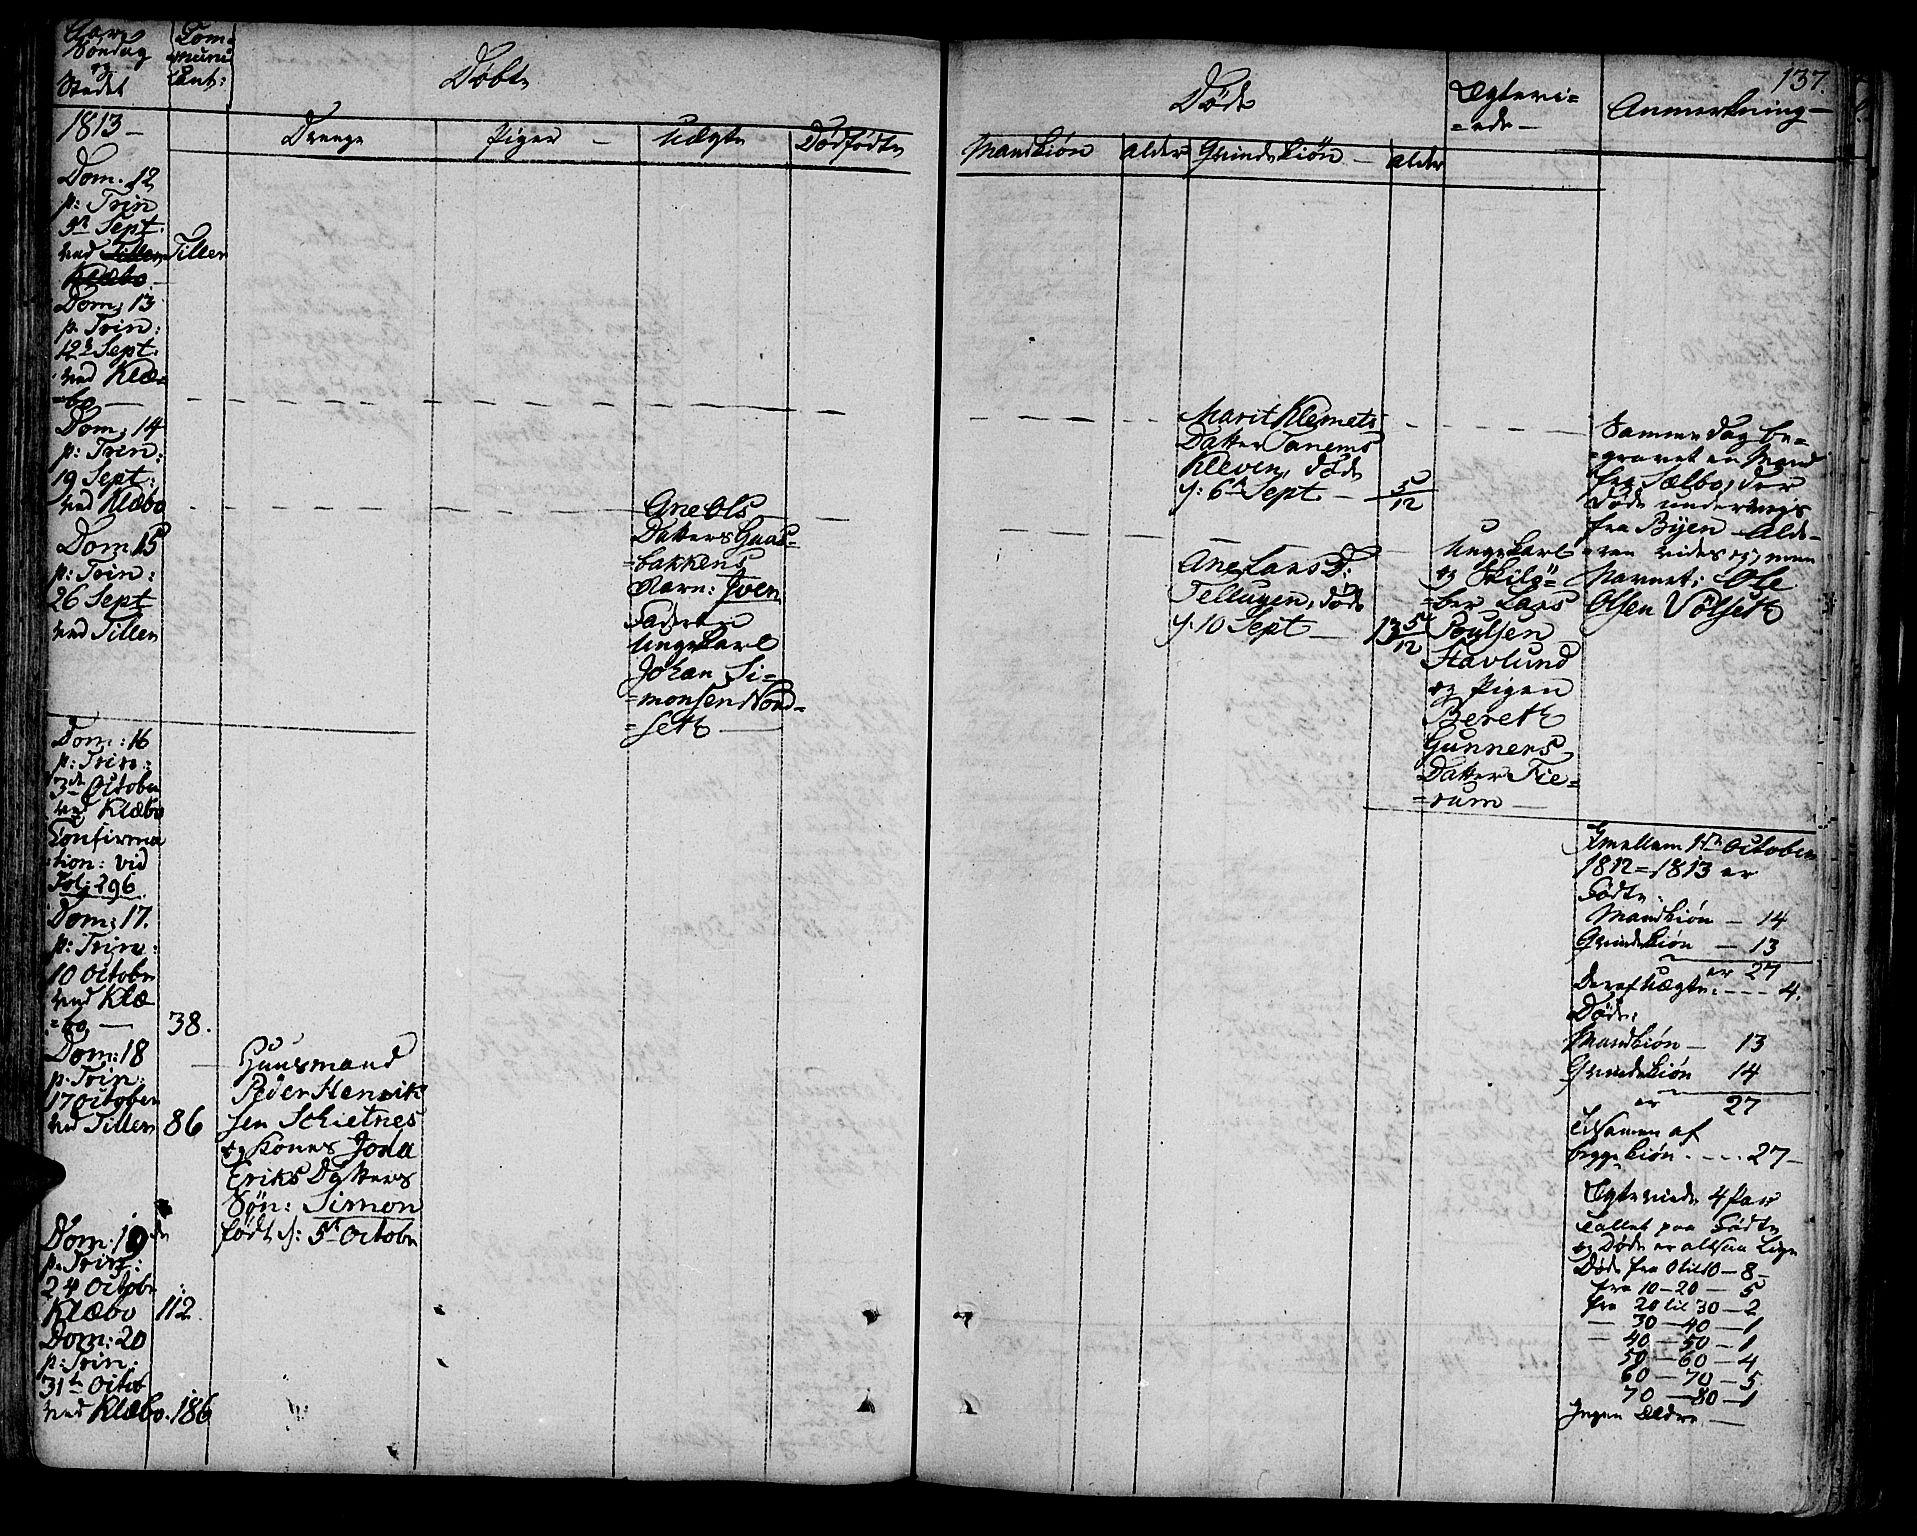 SAT, Ministerialprotokoller, klokkerbøker og fødselsregistre - Sør-Trøndelag, 618/L0438: Parish register (official) no. 618A03, 1783-1815, p. 137